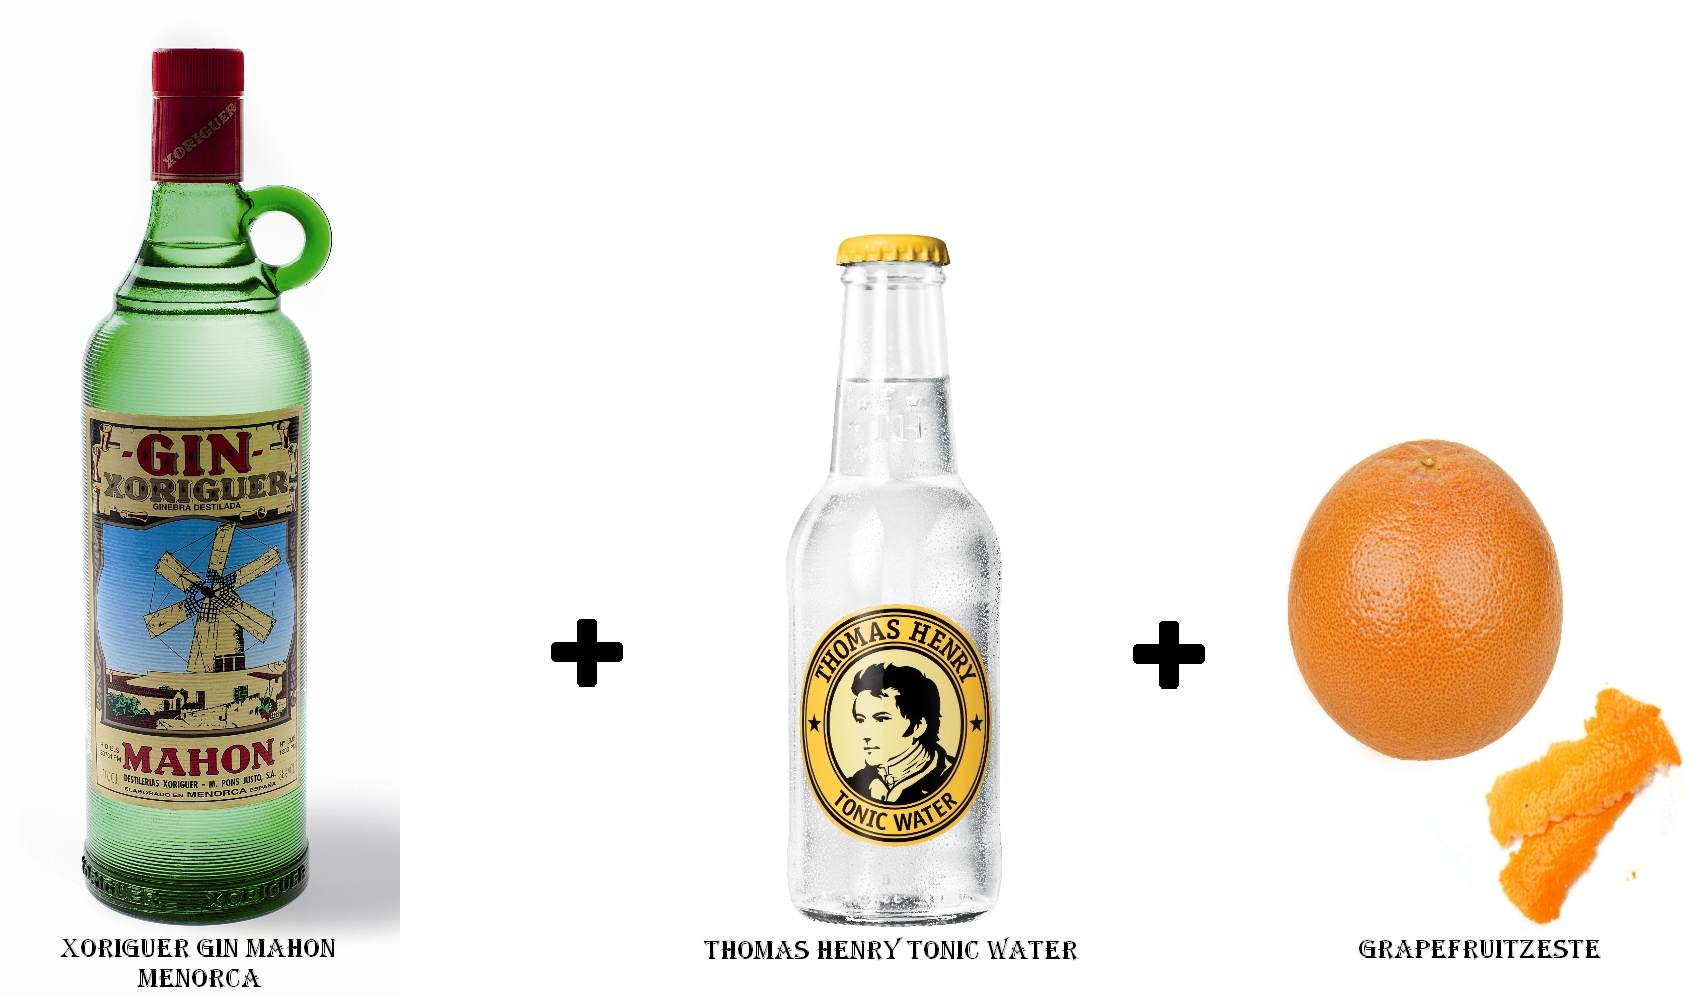 Xoriguer Gin Mahon Menorca + Thomas Henry Tonic Water + Grapefruitzeste